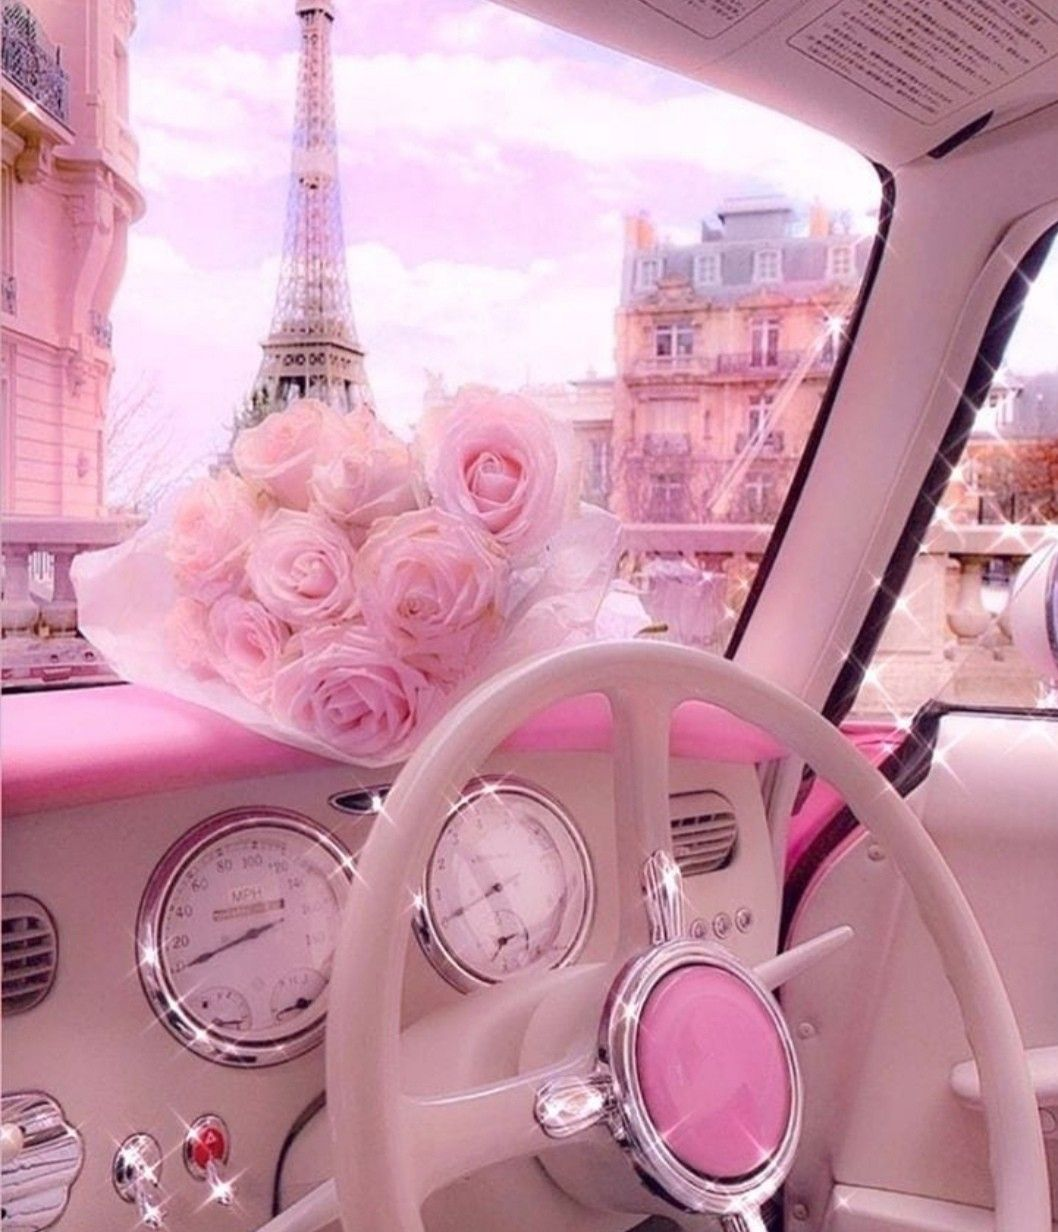 Y2k pink aesthetic | Dessin